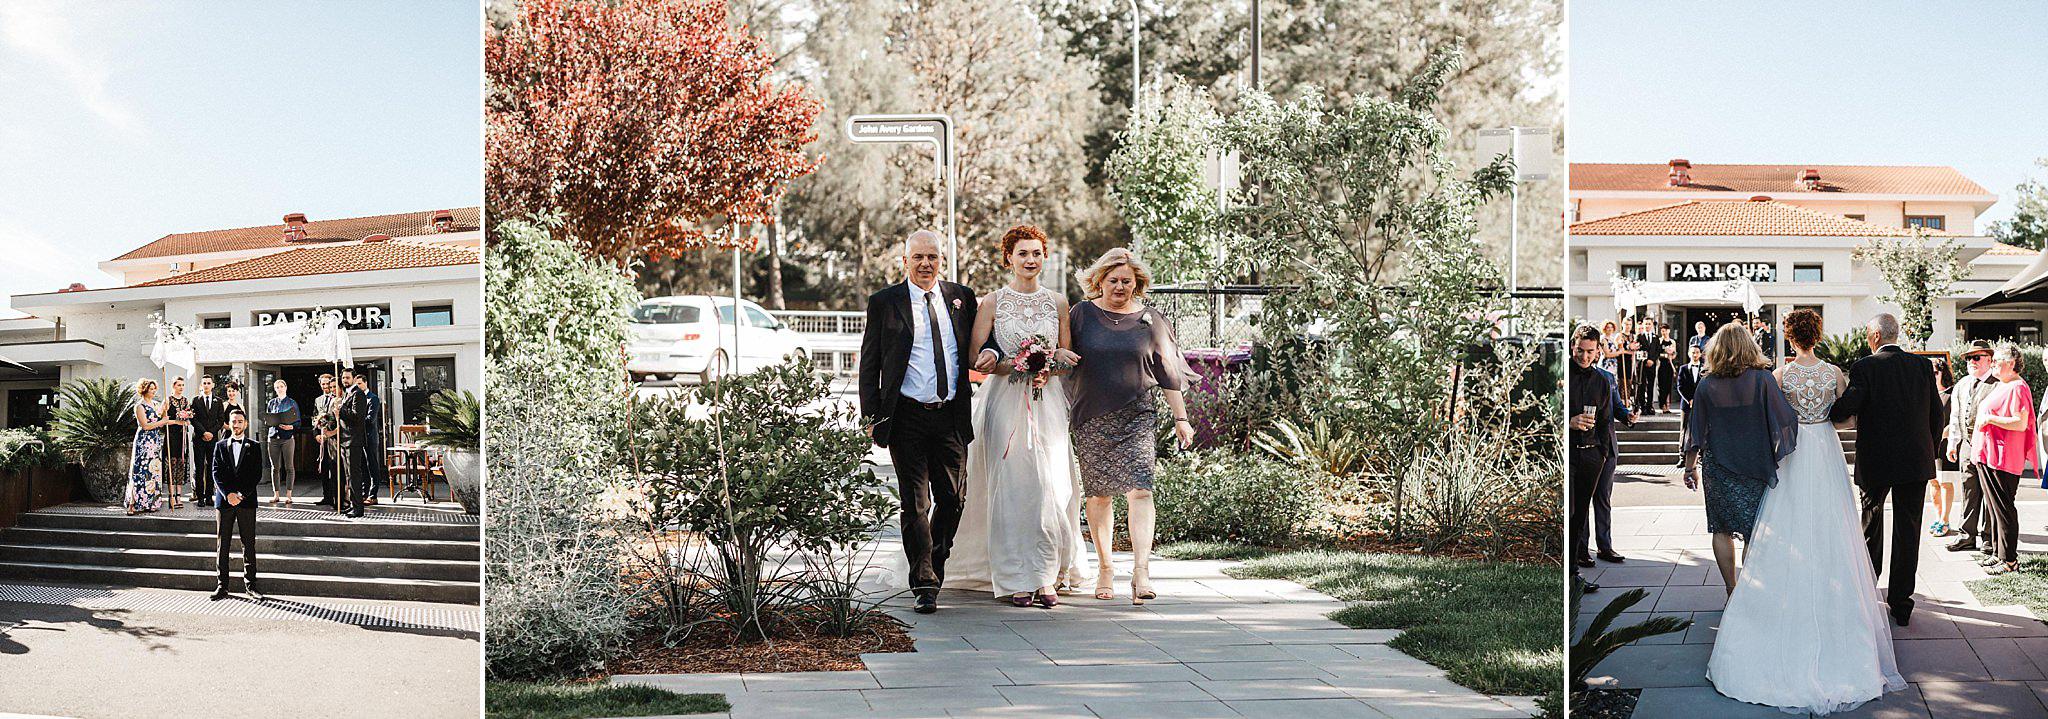 rustic wedding venues canberra